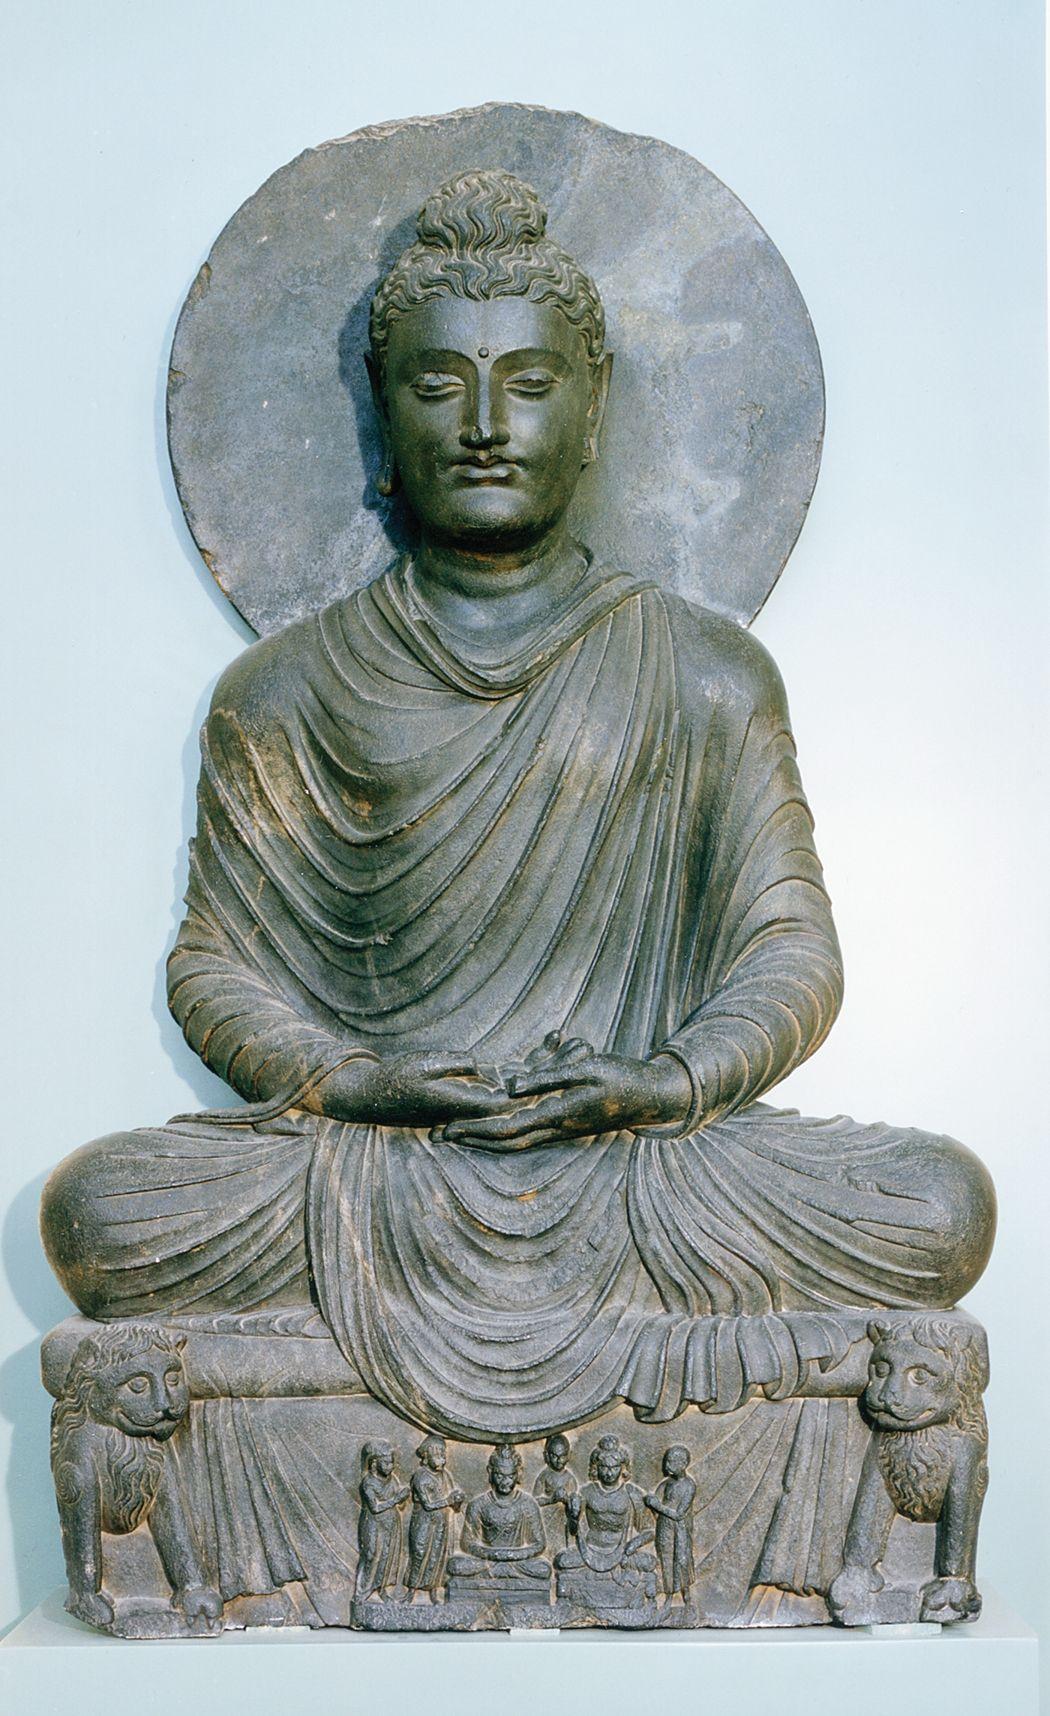 Buddhist Sculpture Meditating Buddha From Gandhara Pakistan Second Century Ce Gray Schist 3 7 1 2 High Royal Scottish Mu Buddhist Art Buddha Buddhist